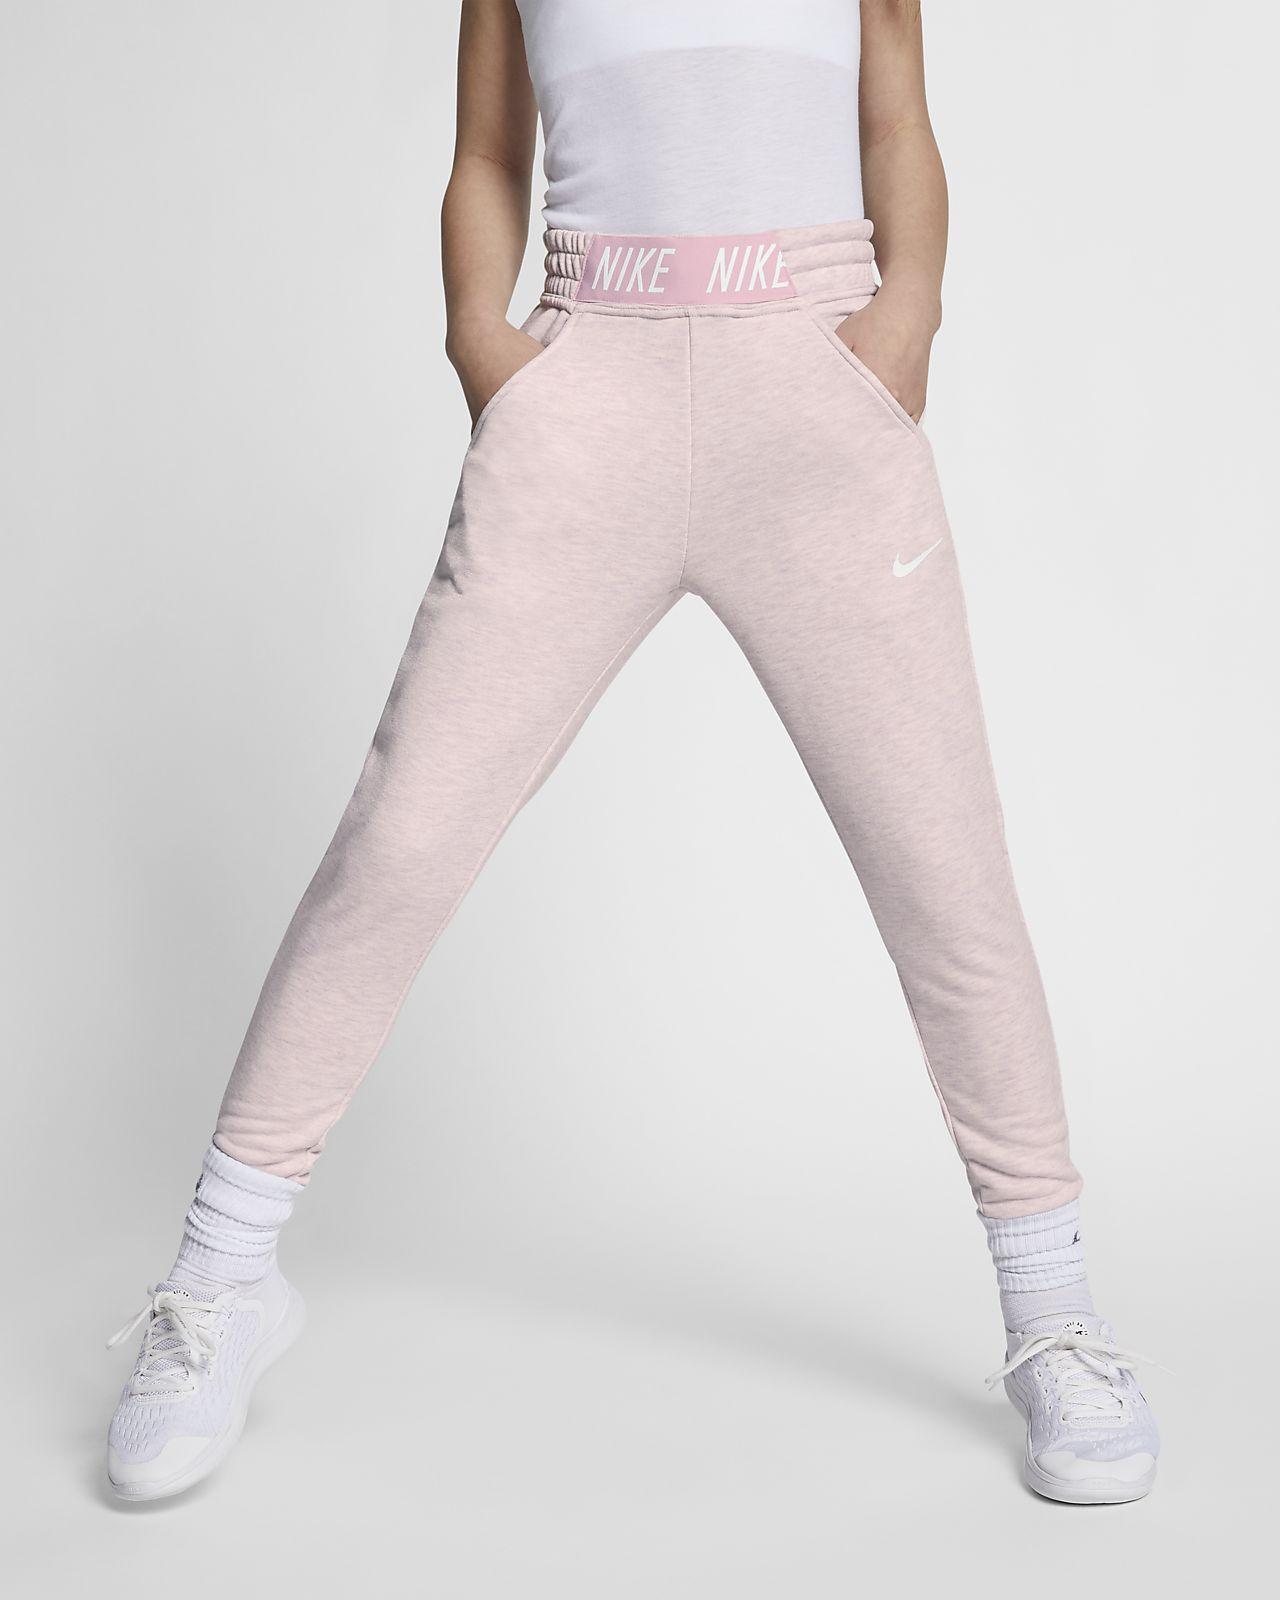 Nike Trainingshose für ältere Kinder (Mädchen)